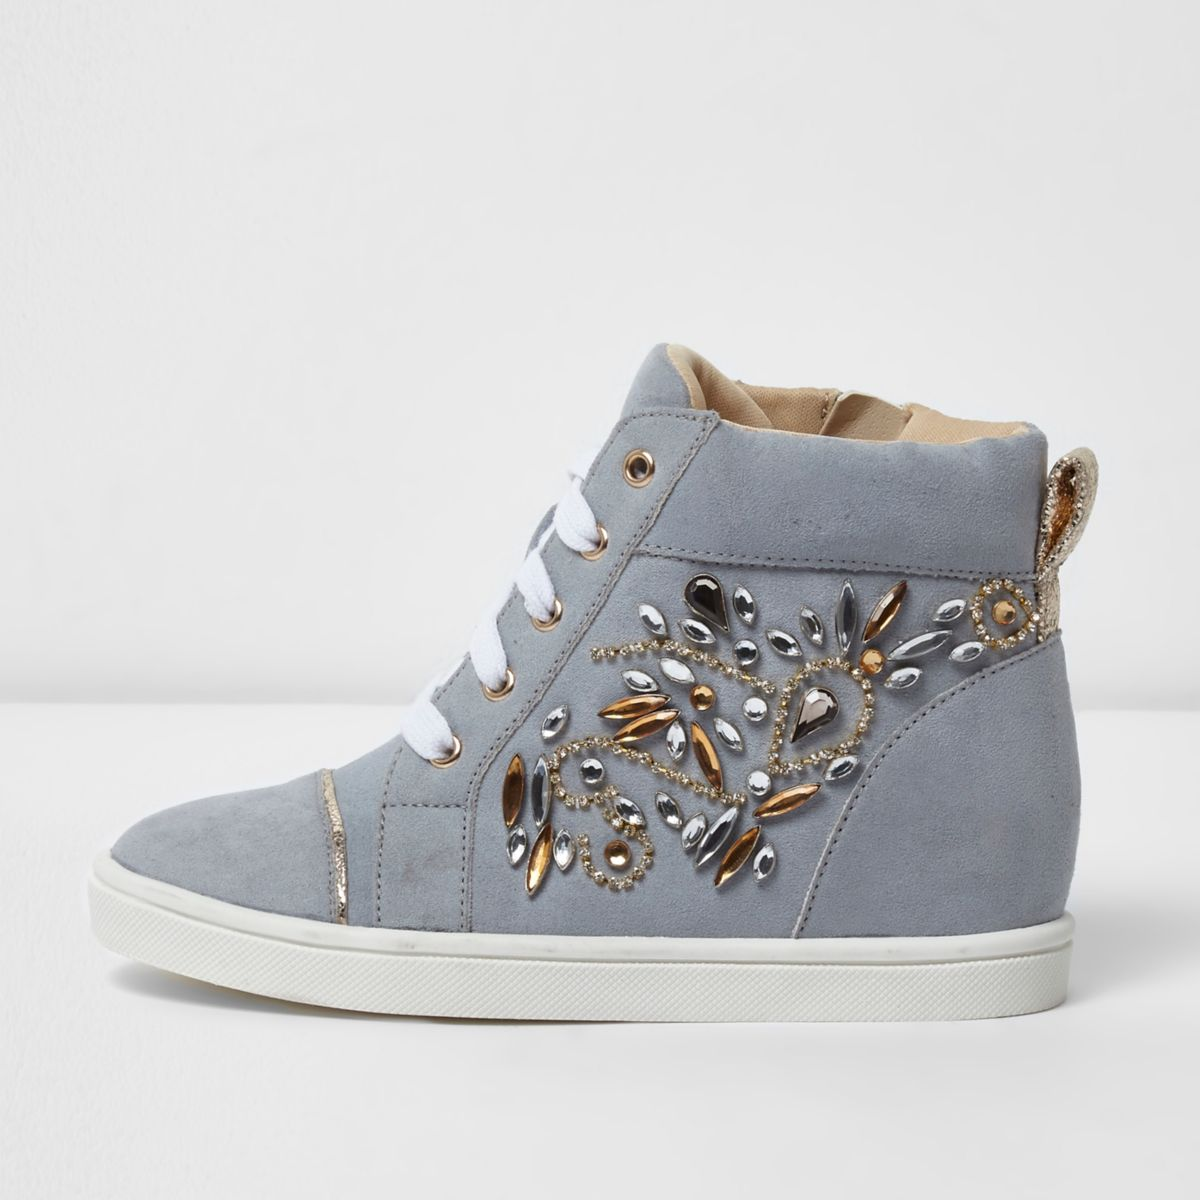 Girls blue embellished hi top wedged sneakers